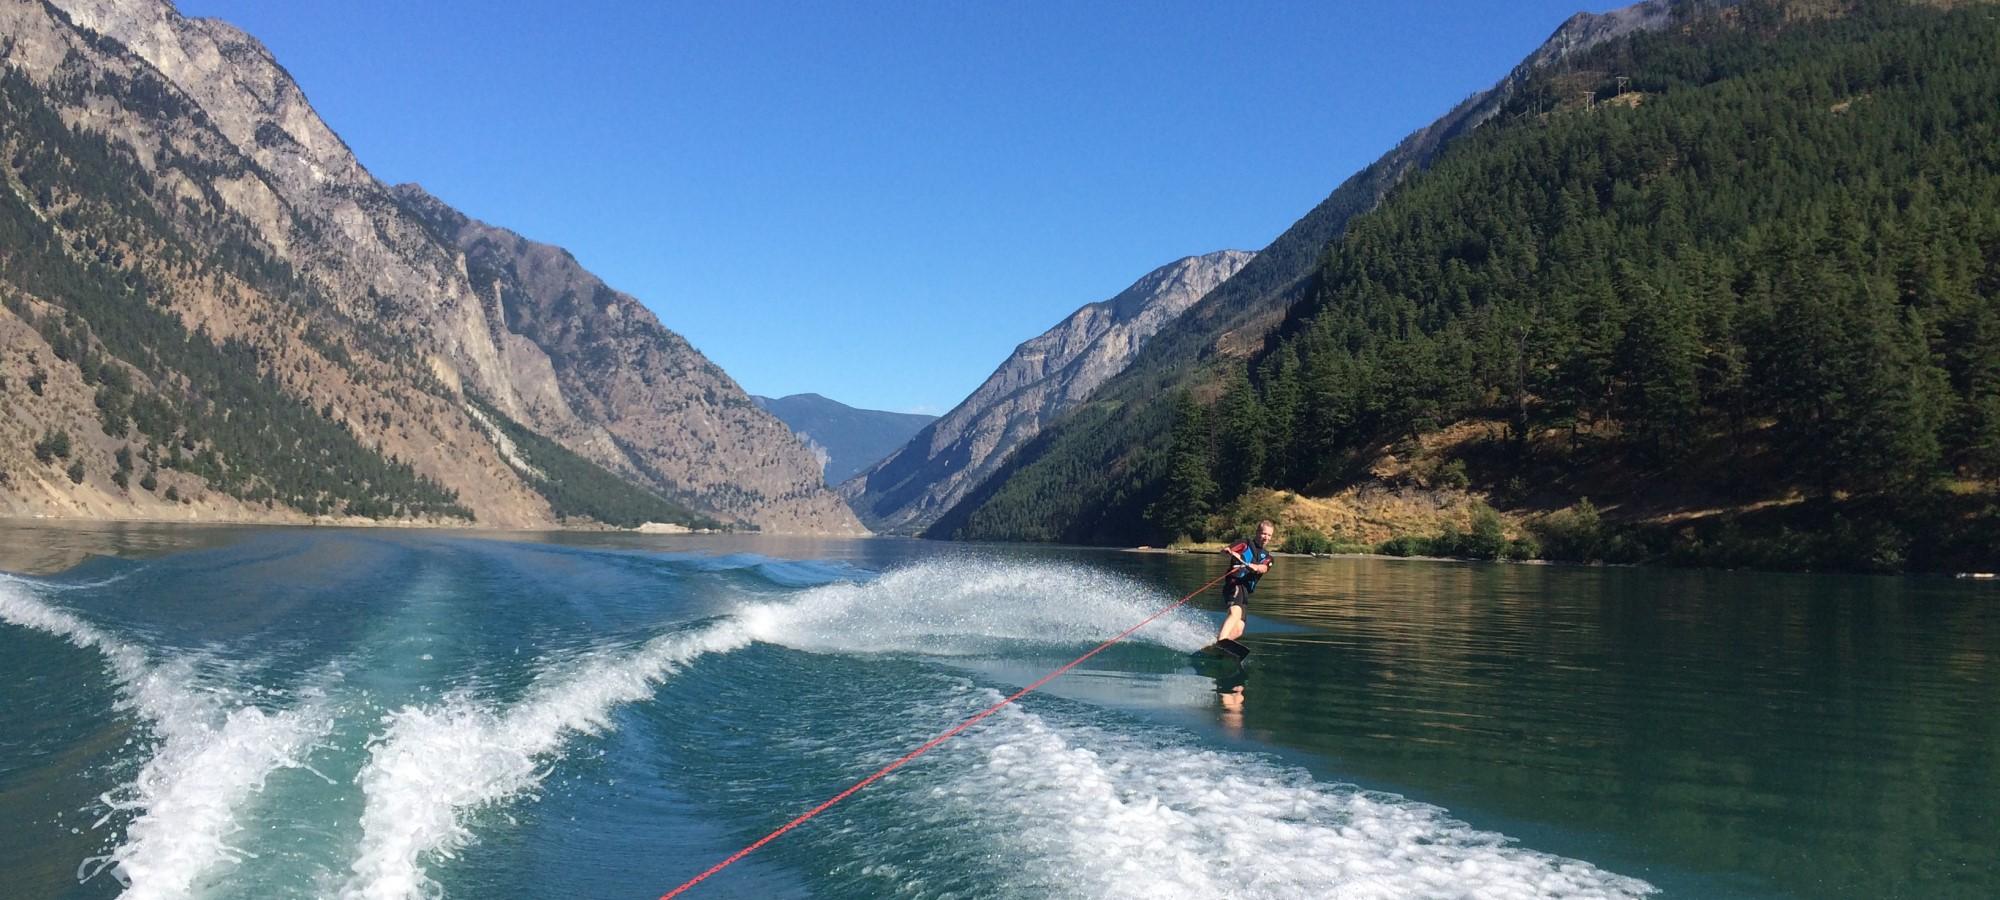 Seton Lake Recreational Area, Lillooet, BC